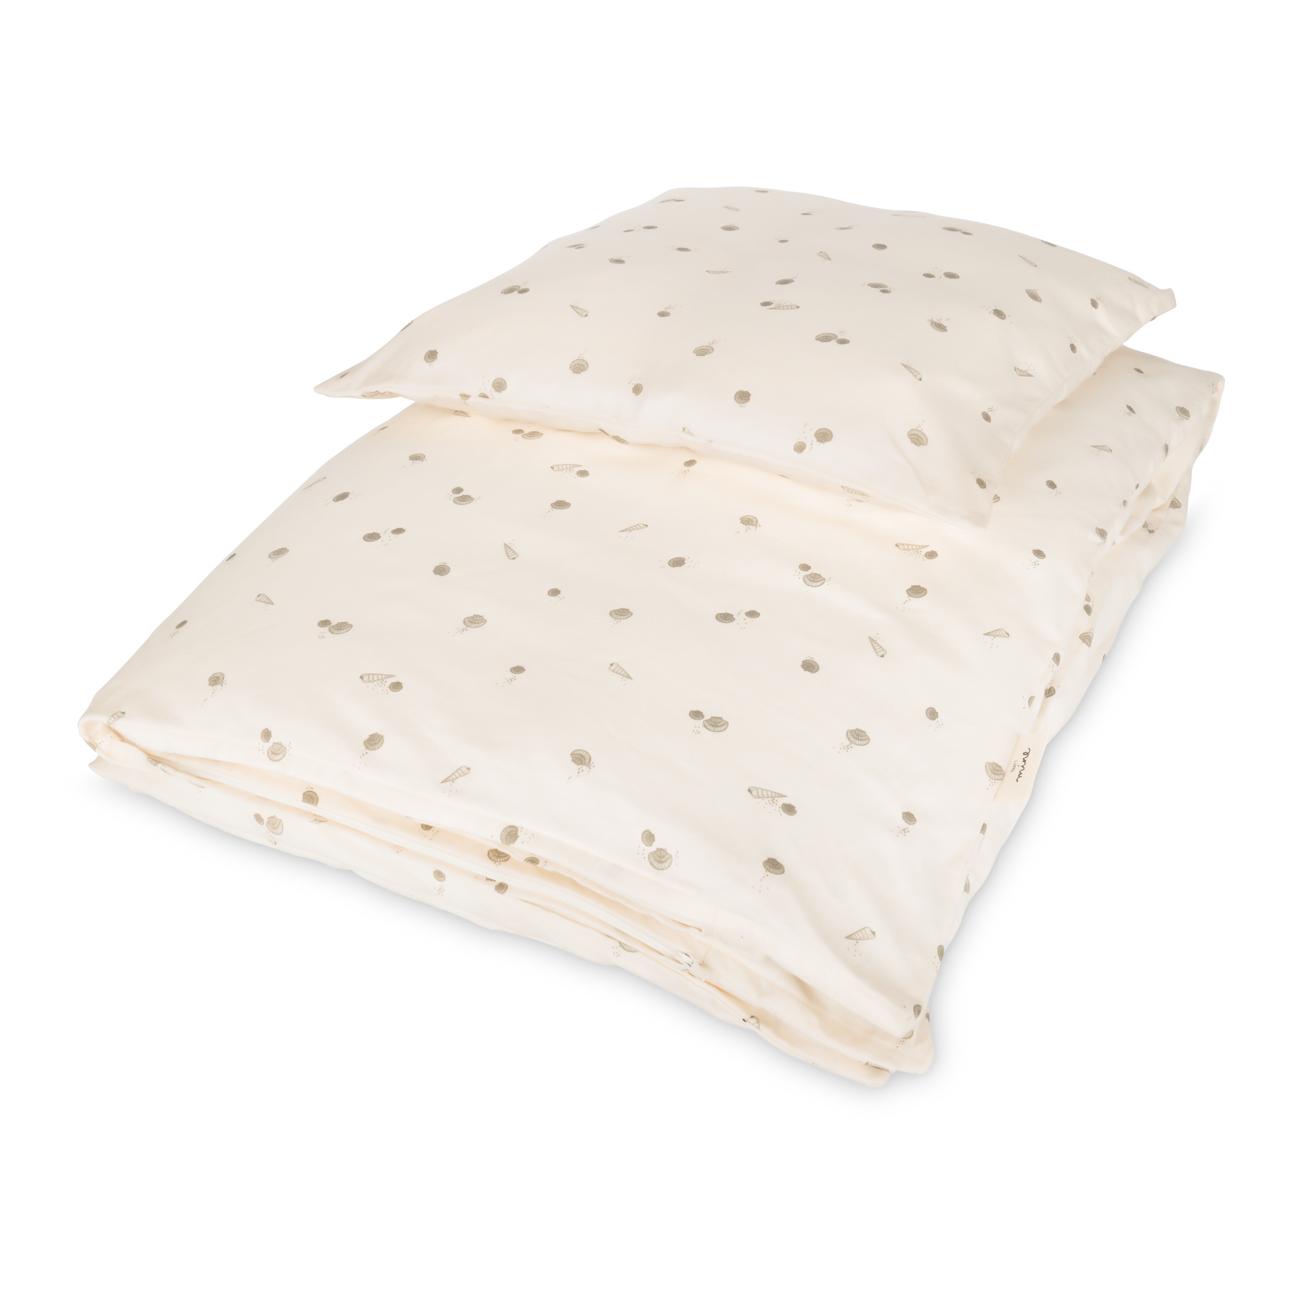 That's Mine - Baby Bedding 70 x 100 cm - Sea Shell (BD153)